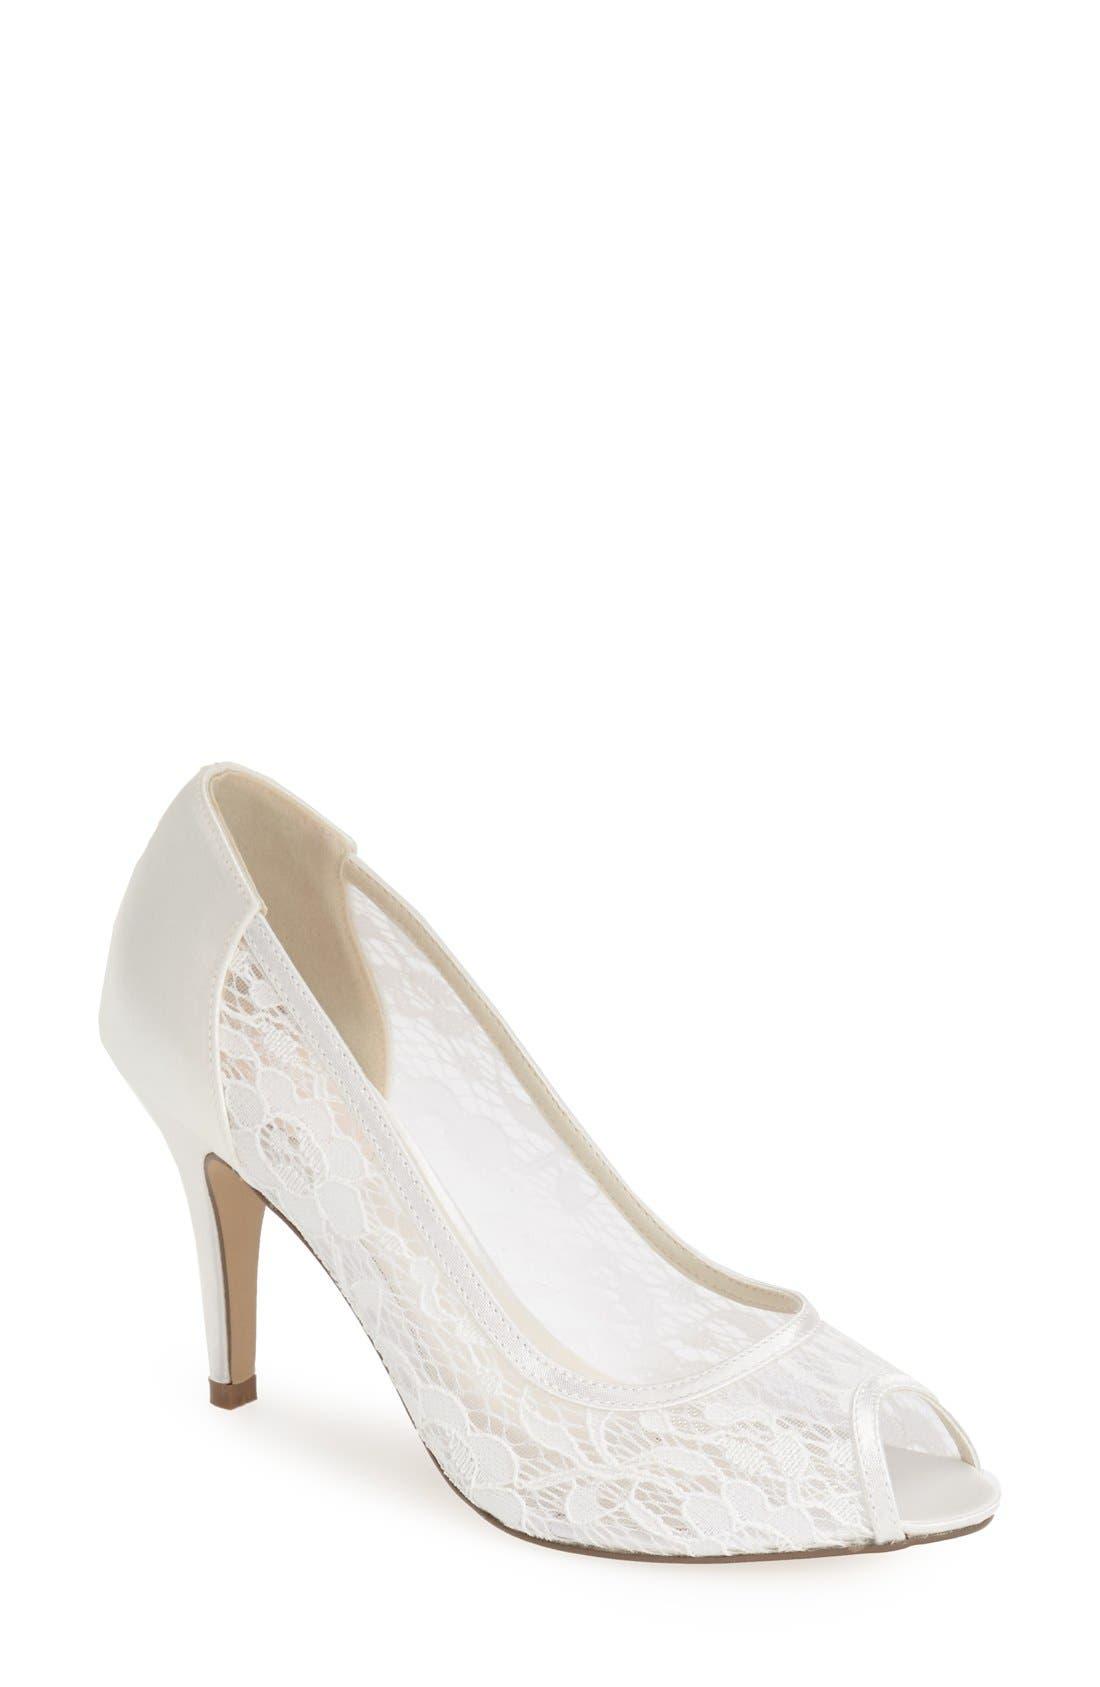 PINK PARADOX LONDON 'Scrumptious' Lace Peep Toe Sandal